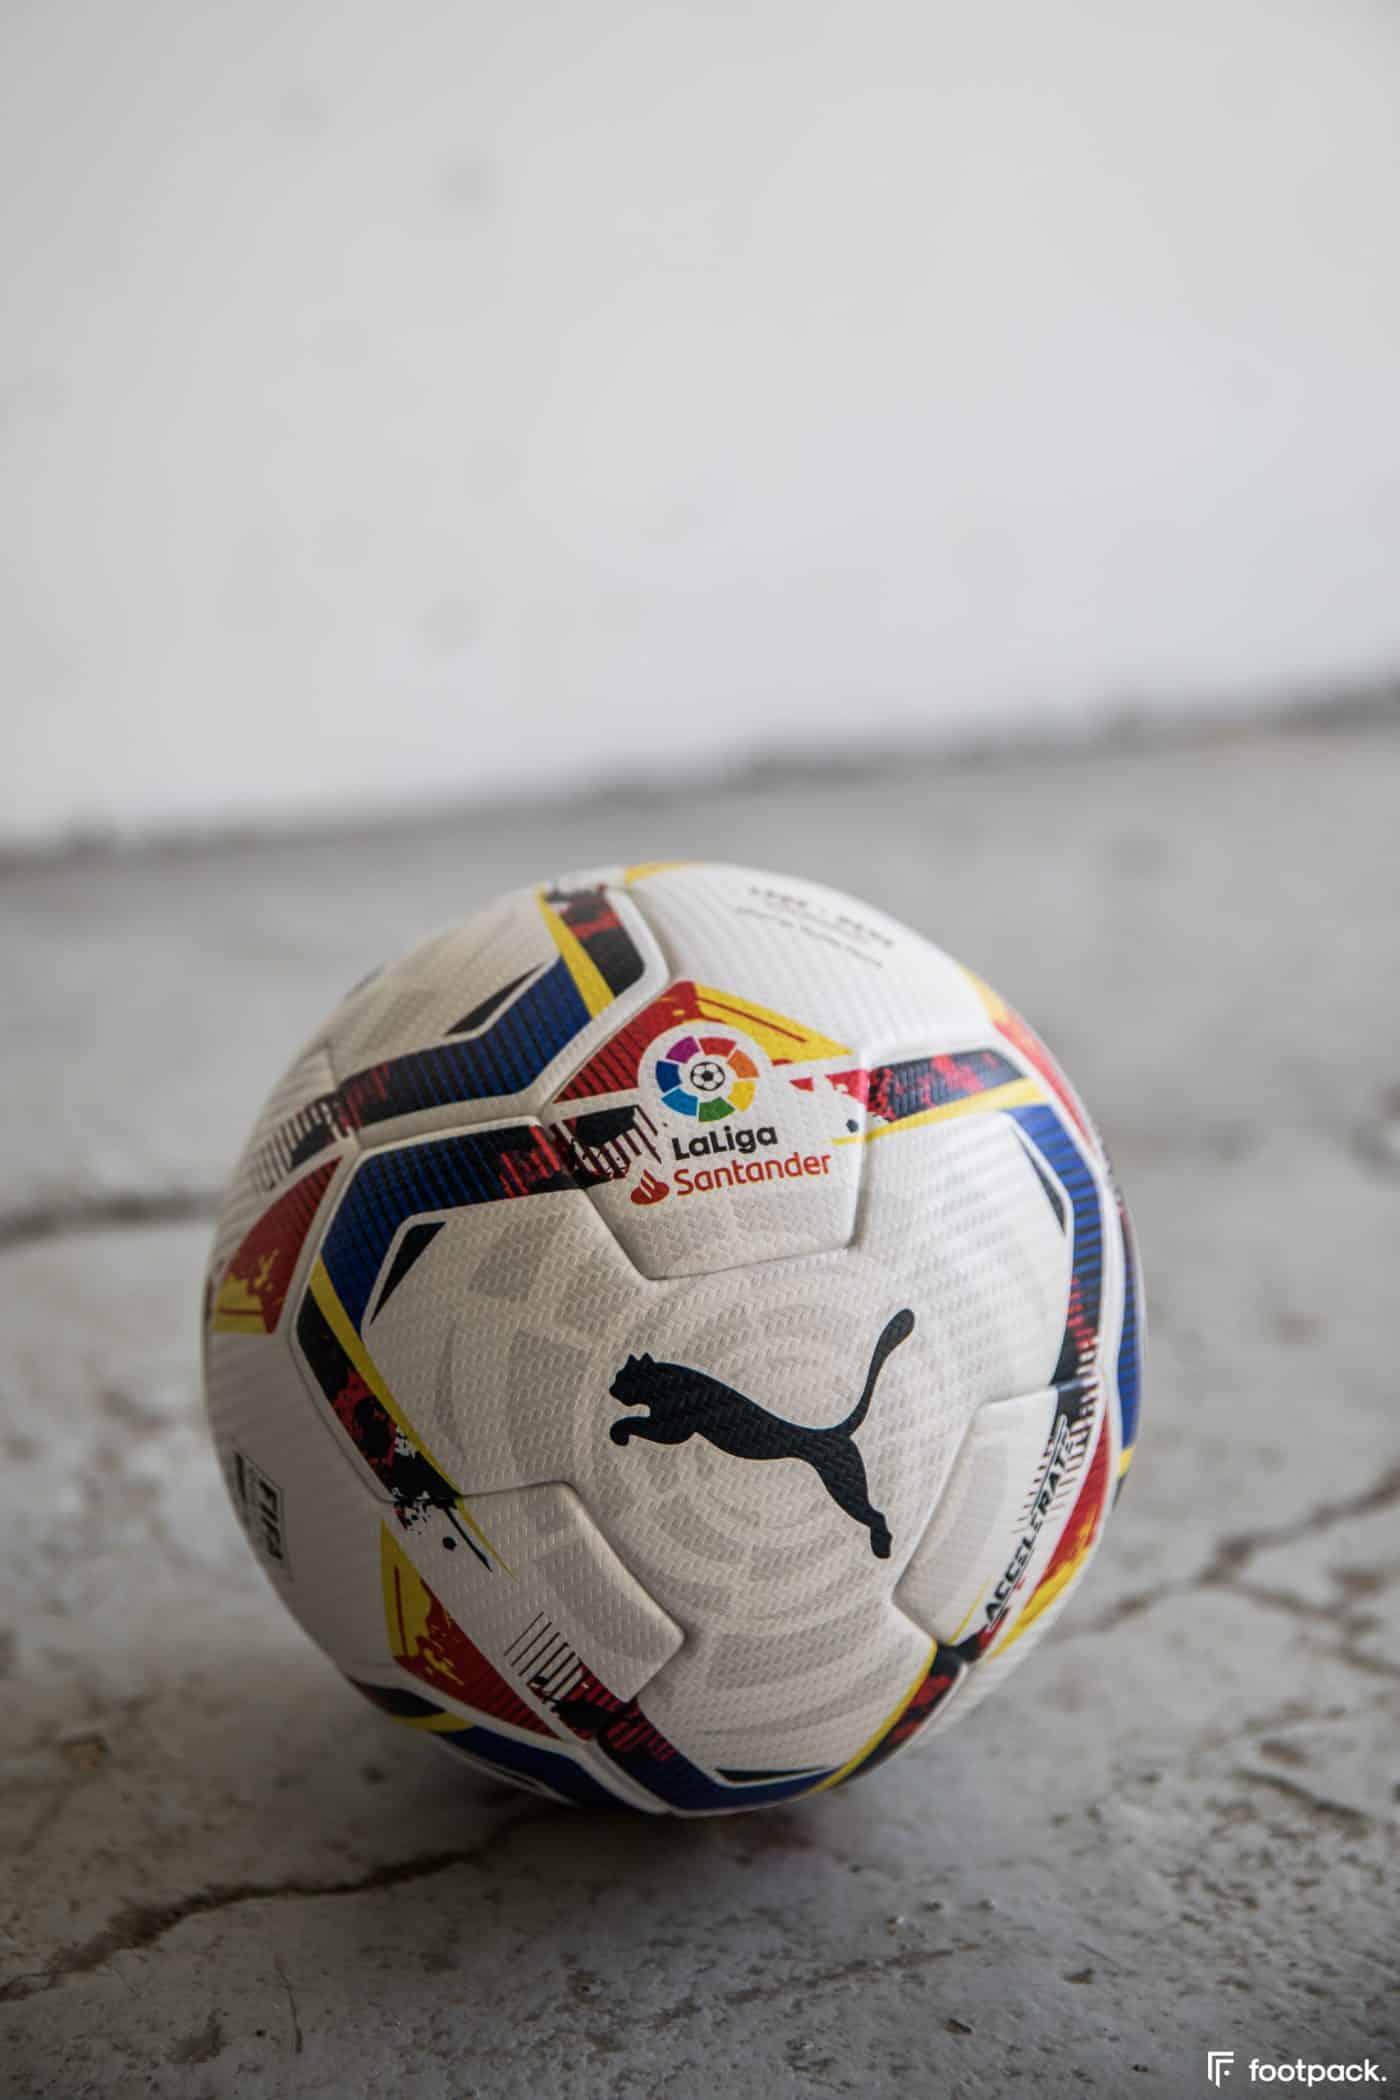 ballon-championnat-espagne-la-liga-2020-2021-puma-footpack-3